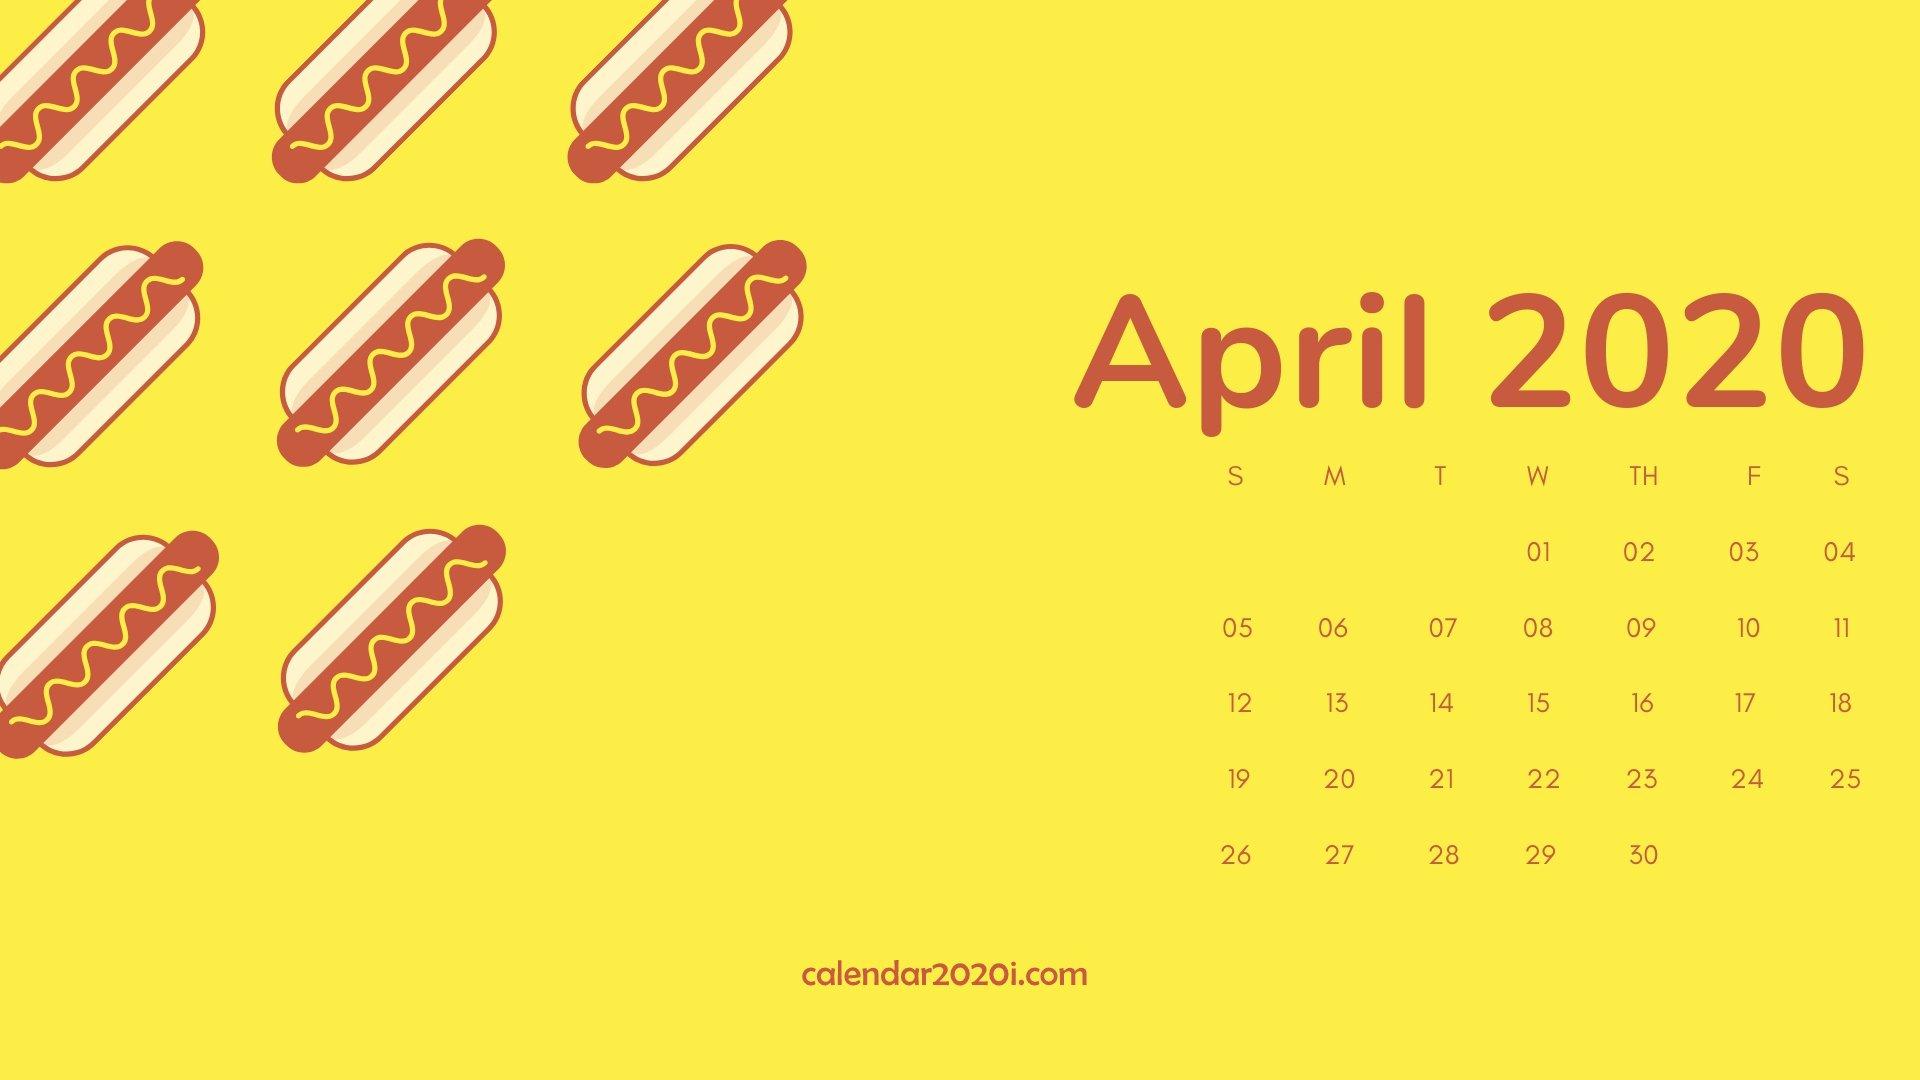 April 2020 Calendar Desktop Wallpaper